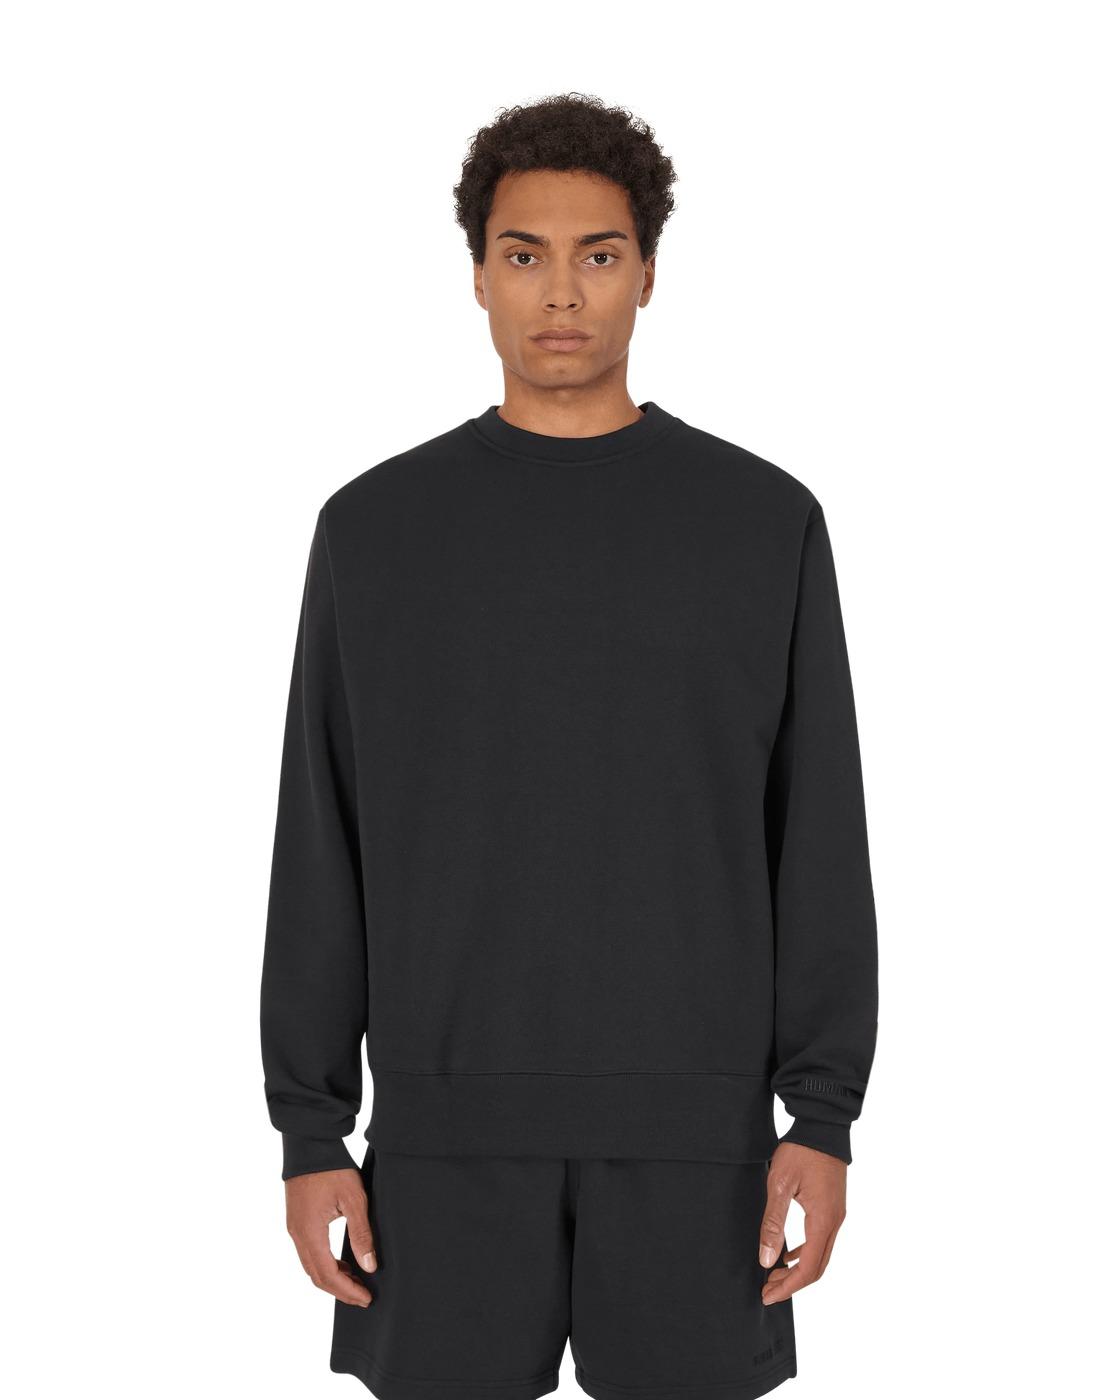 Adidas Originals Pharrell Williams Basics Crewneck Sweatshirt Black